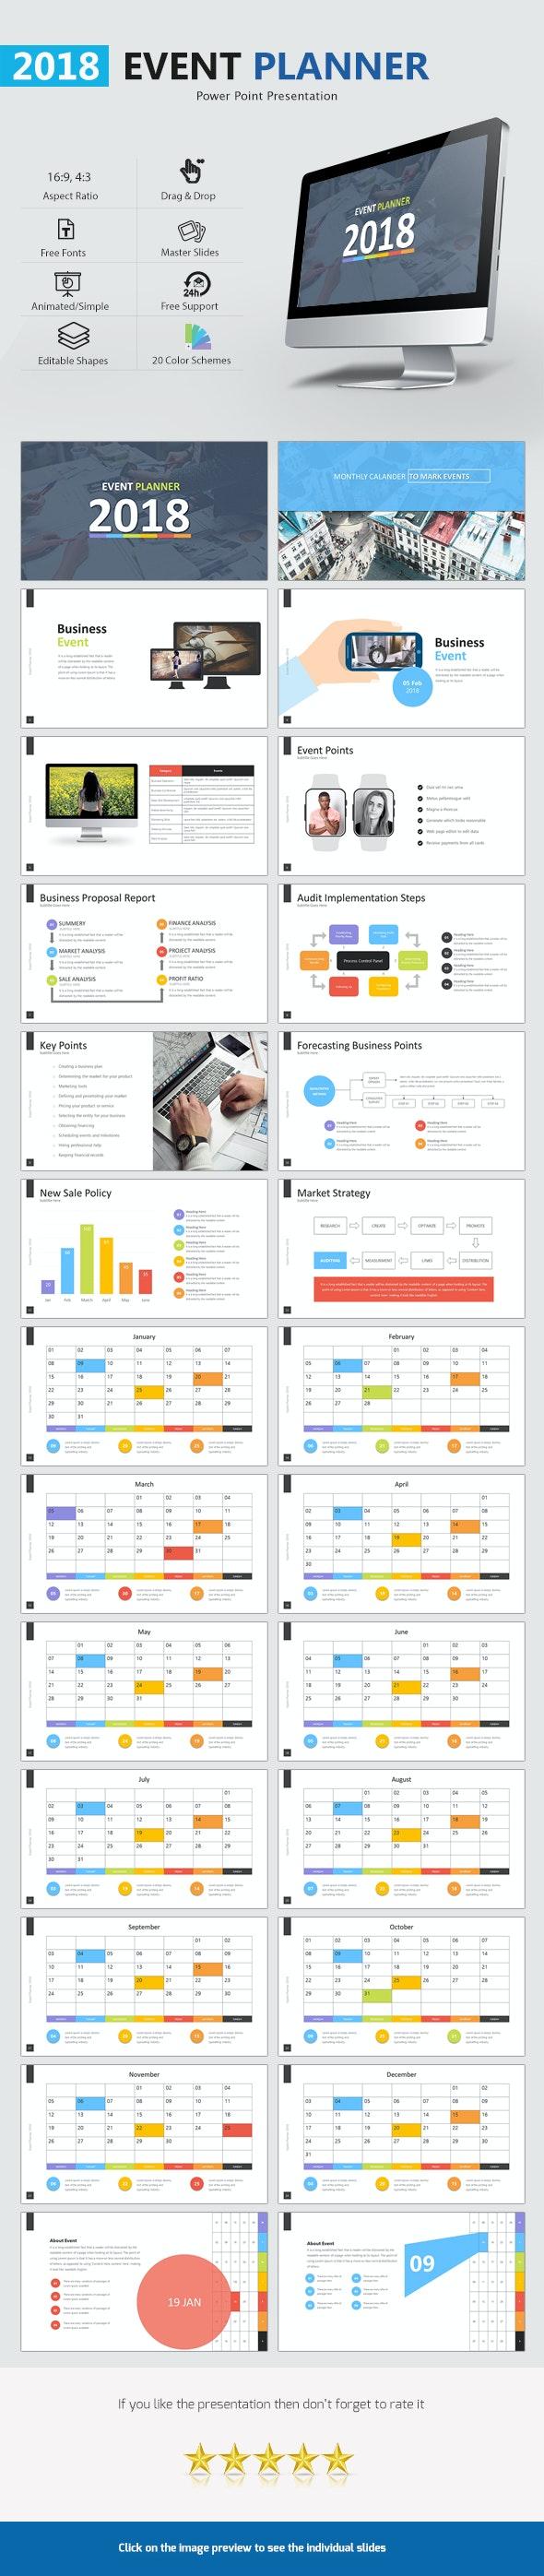 Event Planner 2018 Presentation - Business PowerPoint Templates